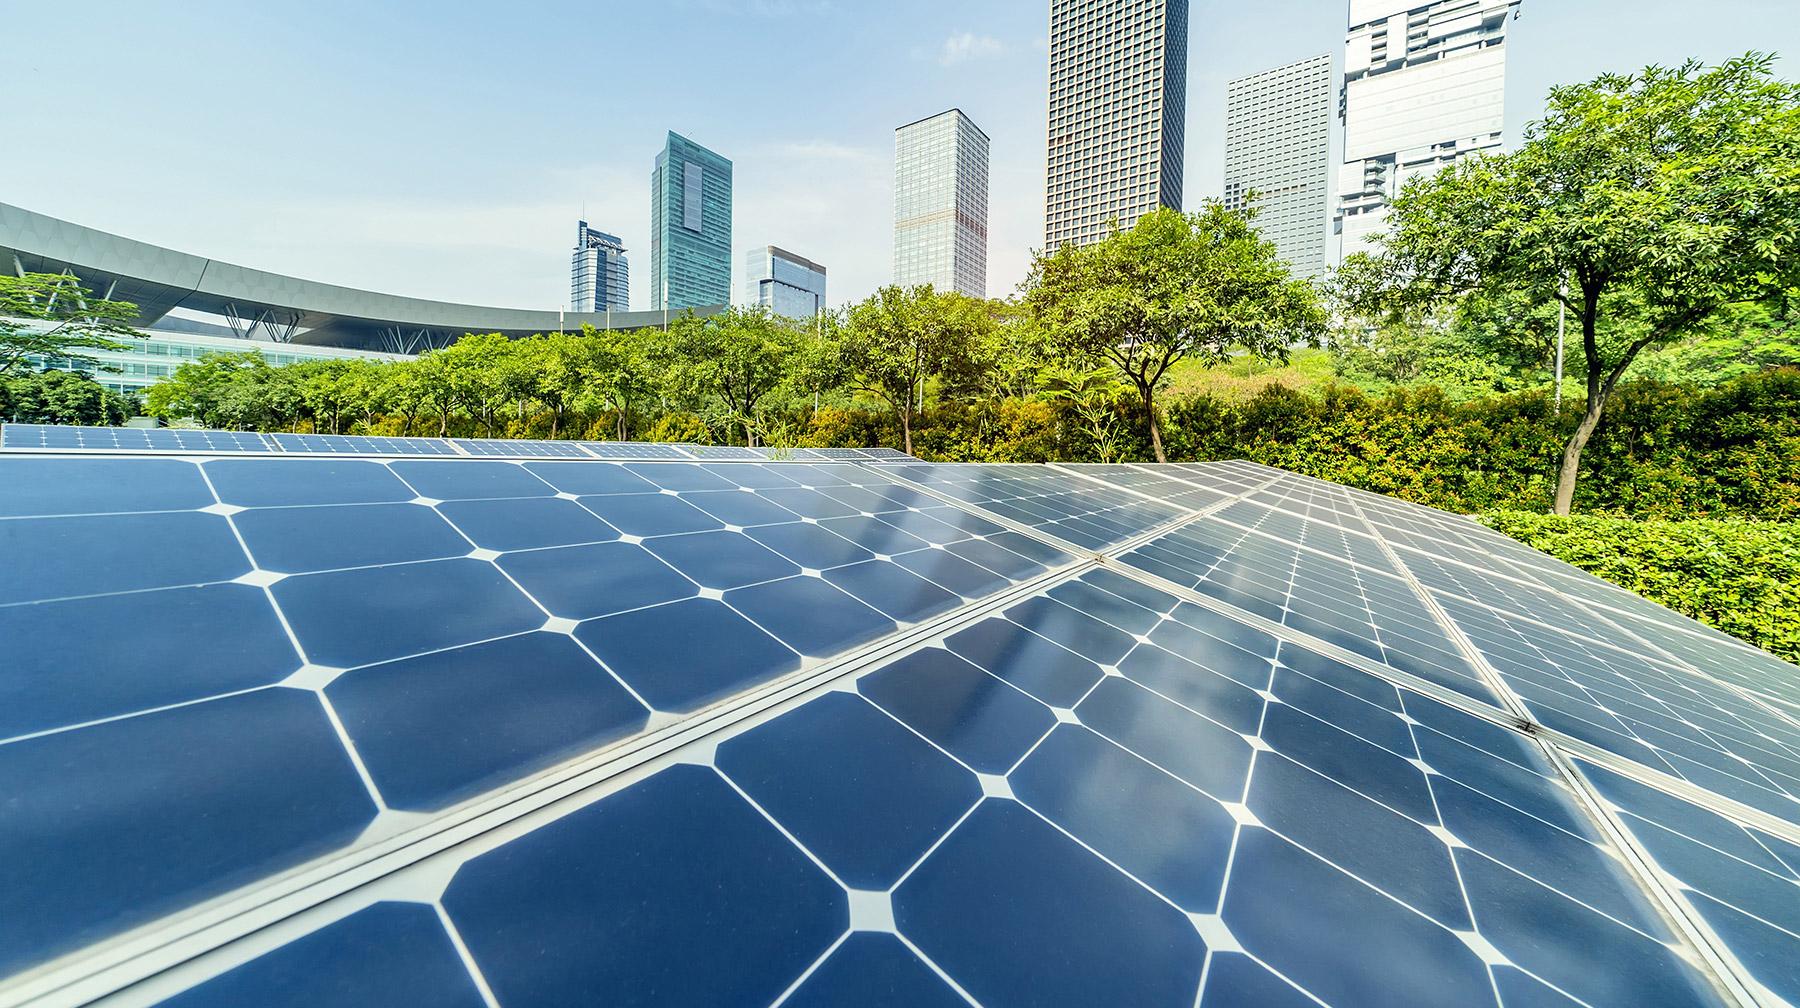 FUTURE ENERGY PARTNER